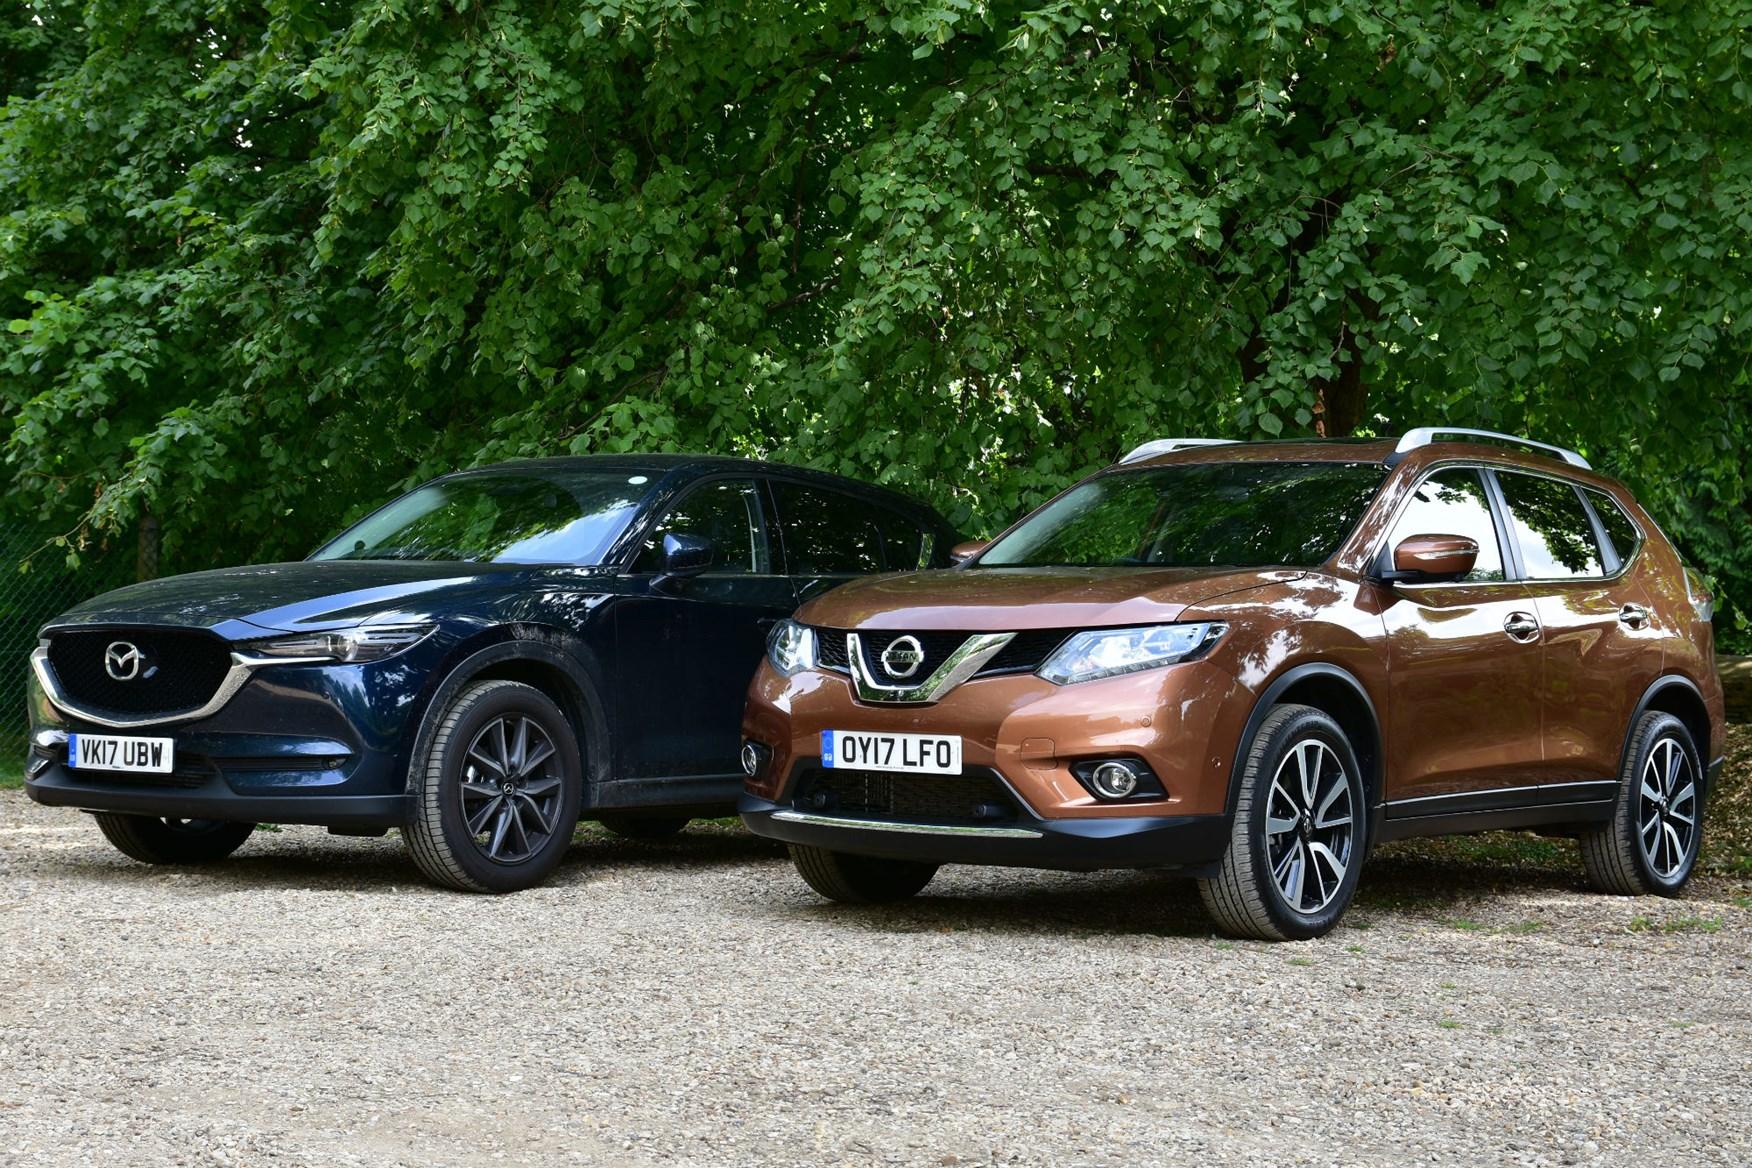 Mazda CX-5 vs Nissan X-Trail